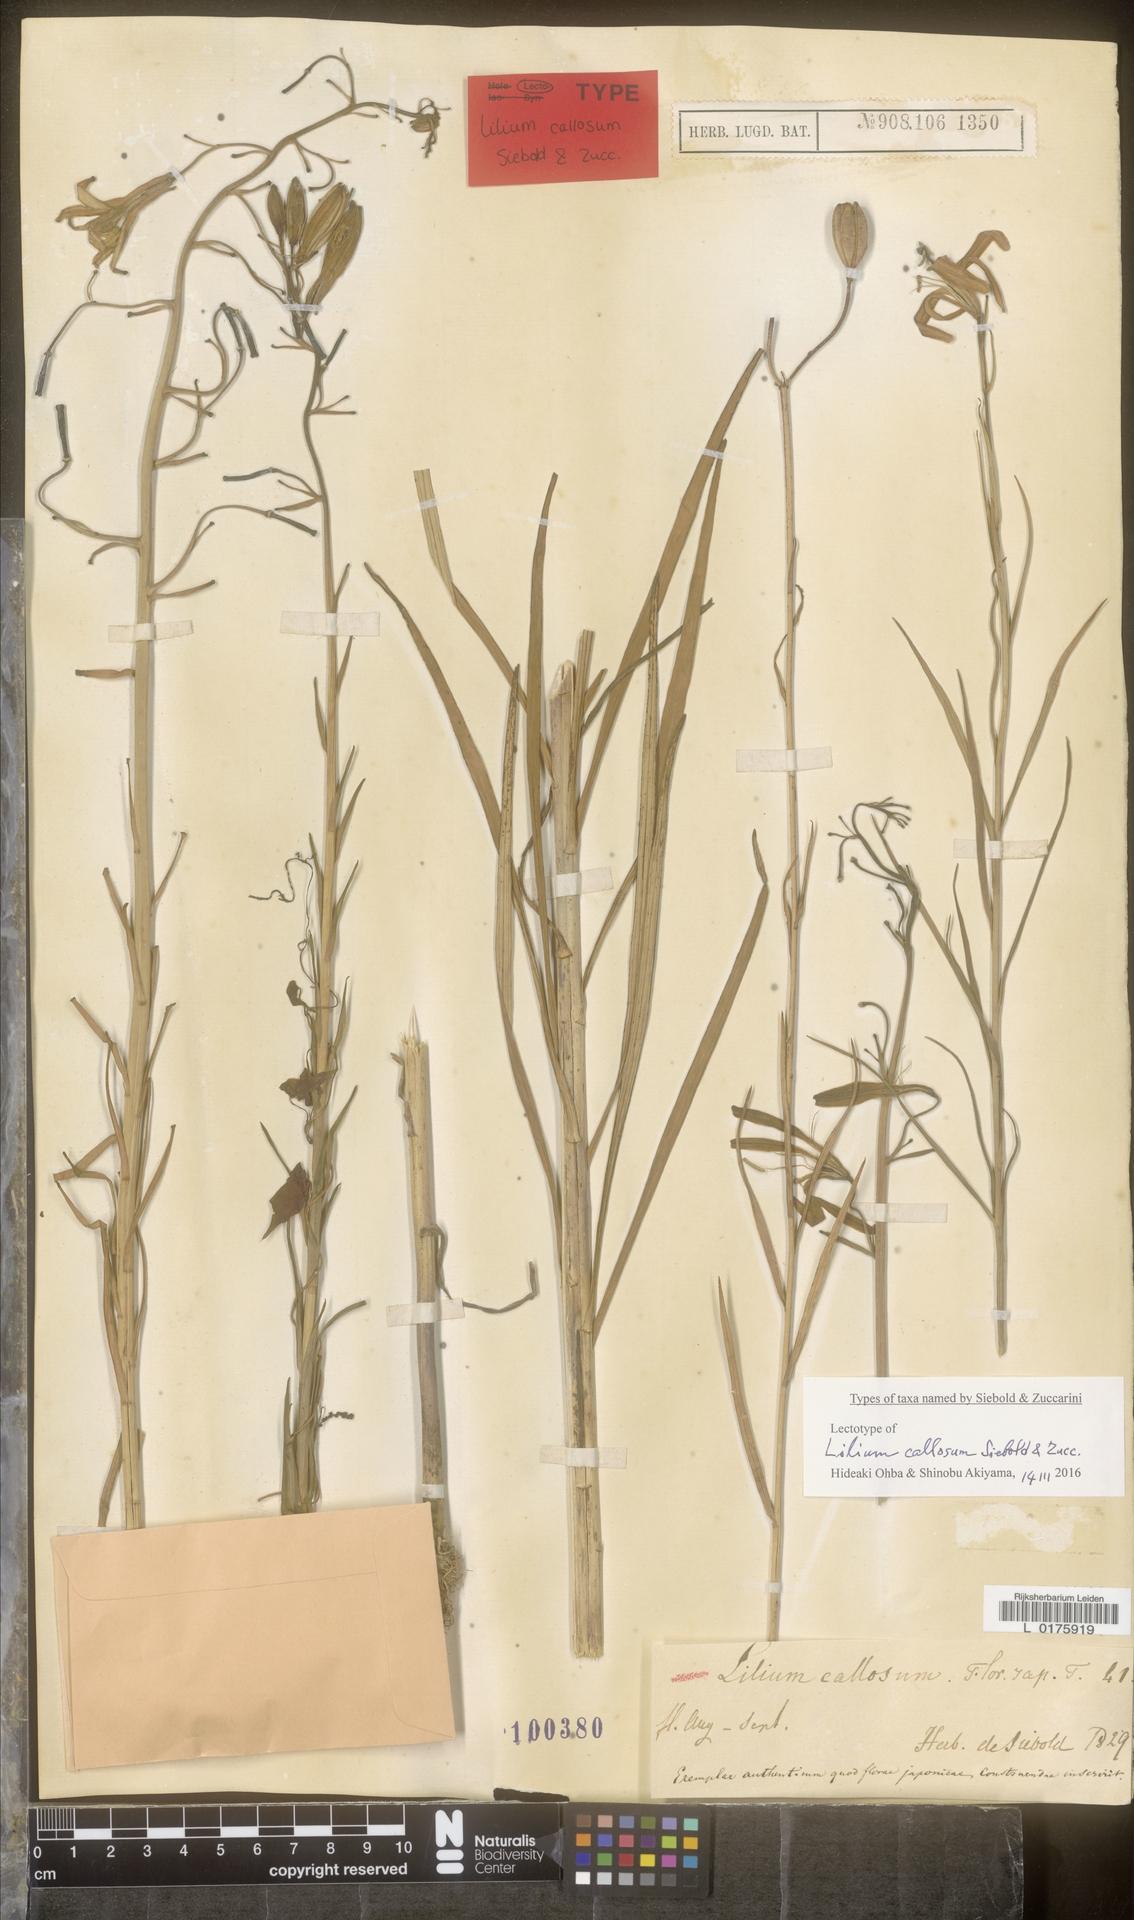 L  0175919 | Lilium callosum Siebold & Zucc.